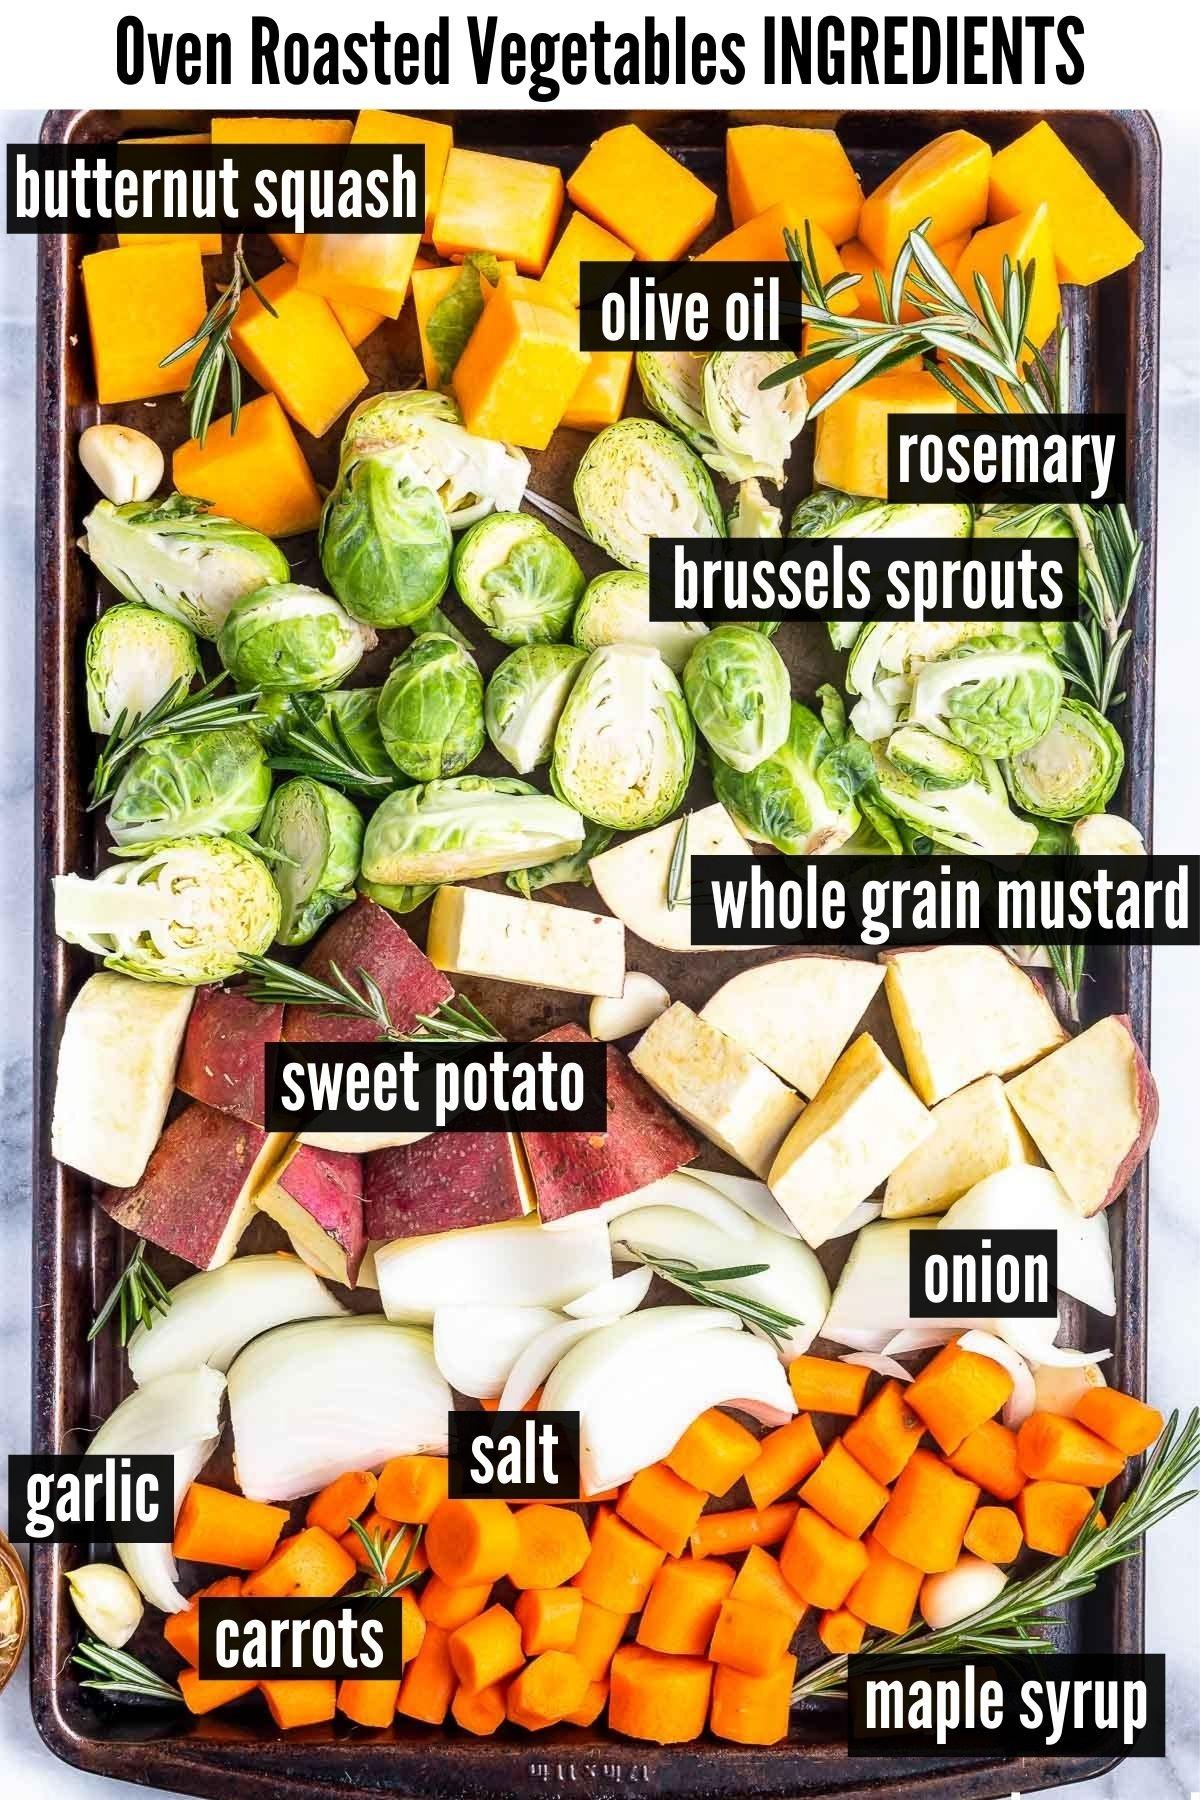 oven roasted vegetables ingredients